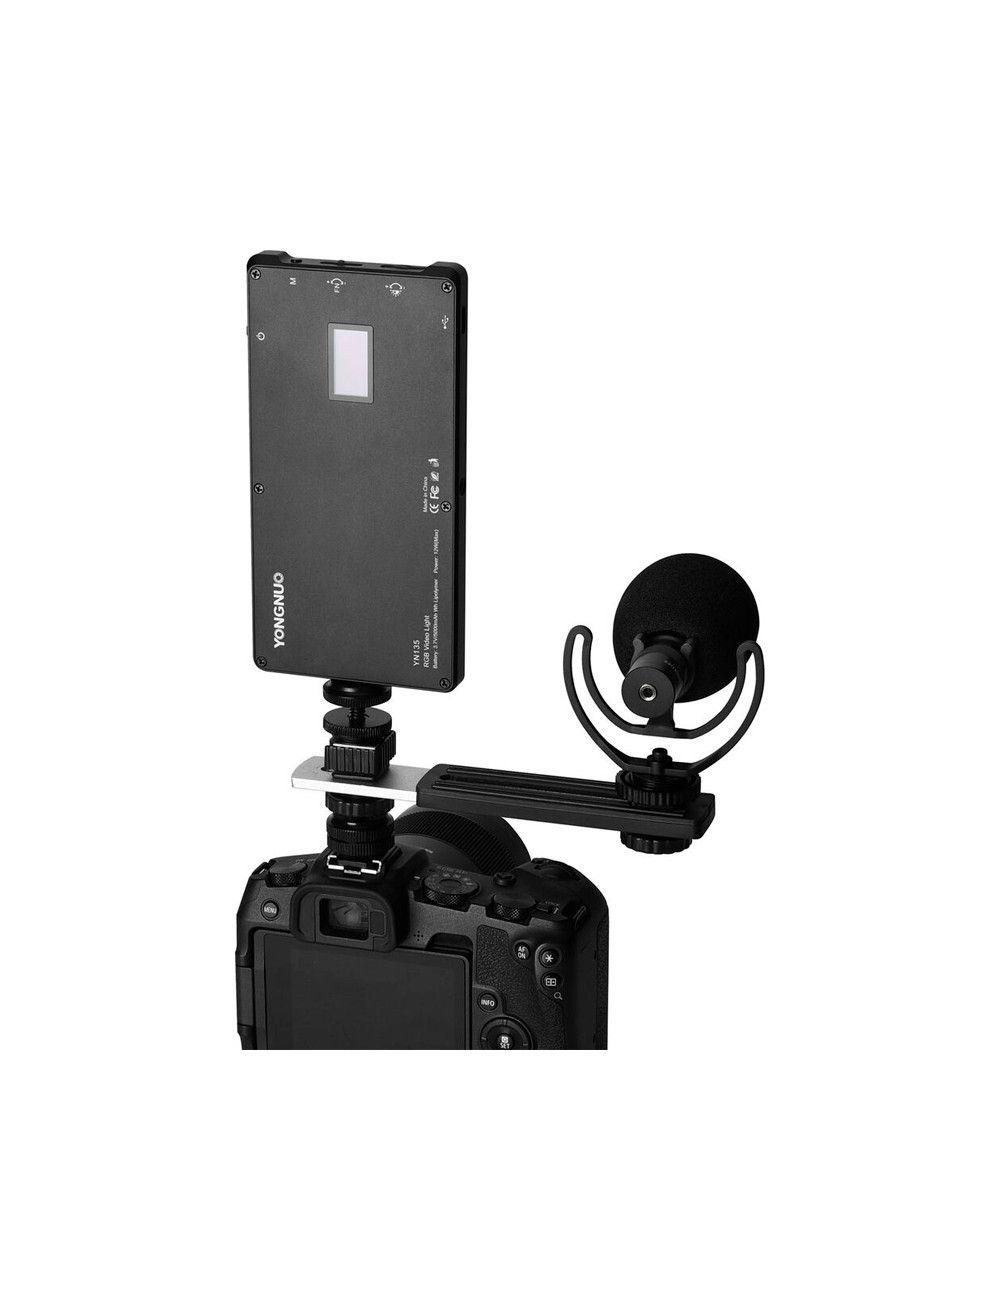 BOYA BY-M2 Micrófono Lavalier (de solapa) Para Iphone Conector Lightning